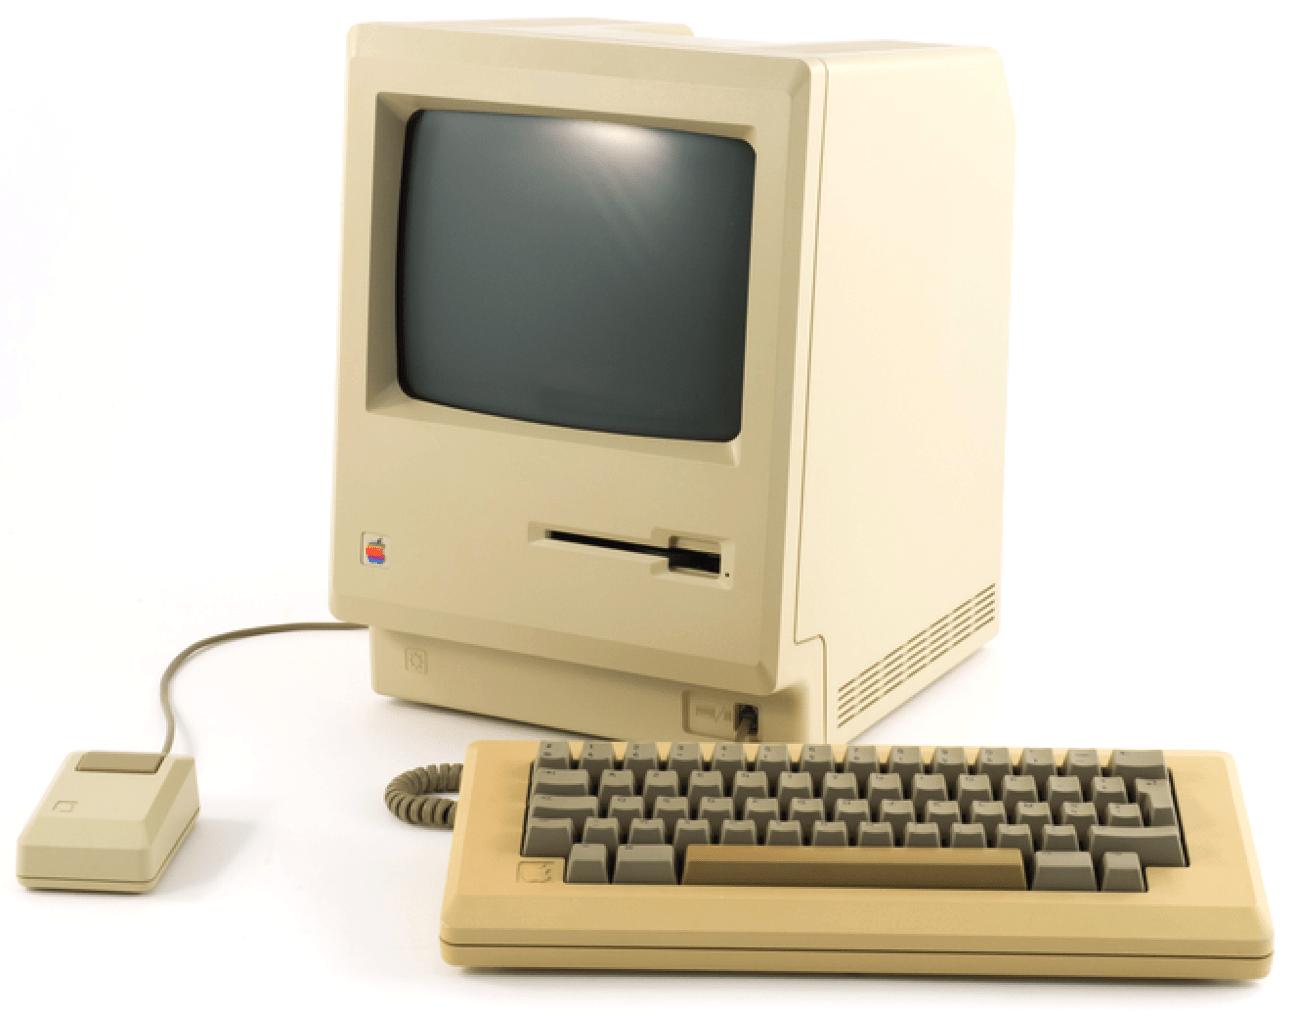 Apple_mac_128k